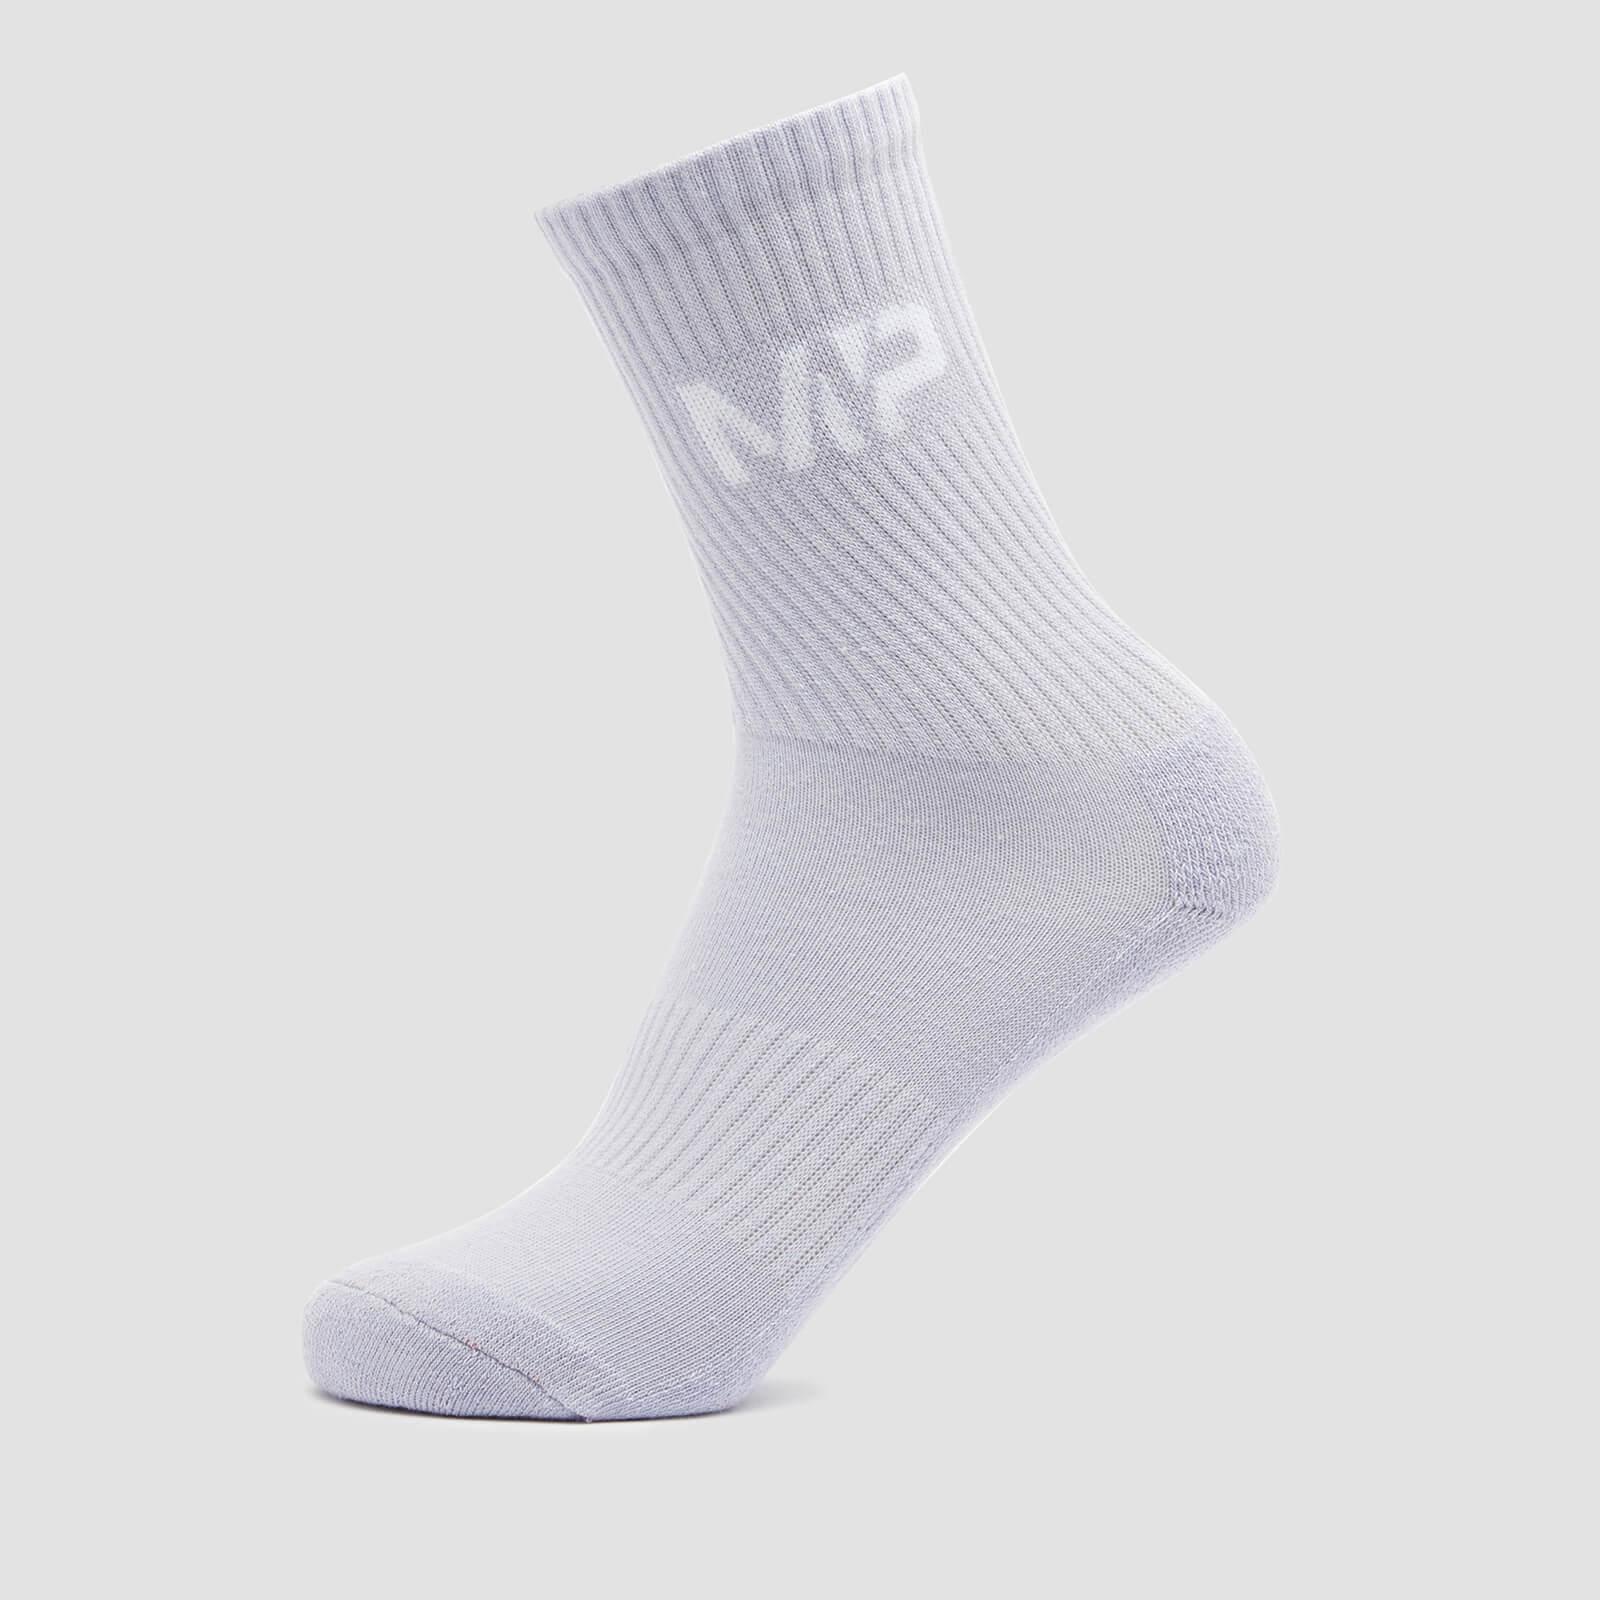 MP Women's Neon Brights Crew Socks (3 Pack) Butterfly/Banana/Lavender - UK 3-6, Myprotein International  - купить со скидкой